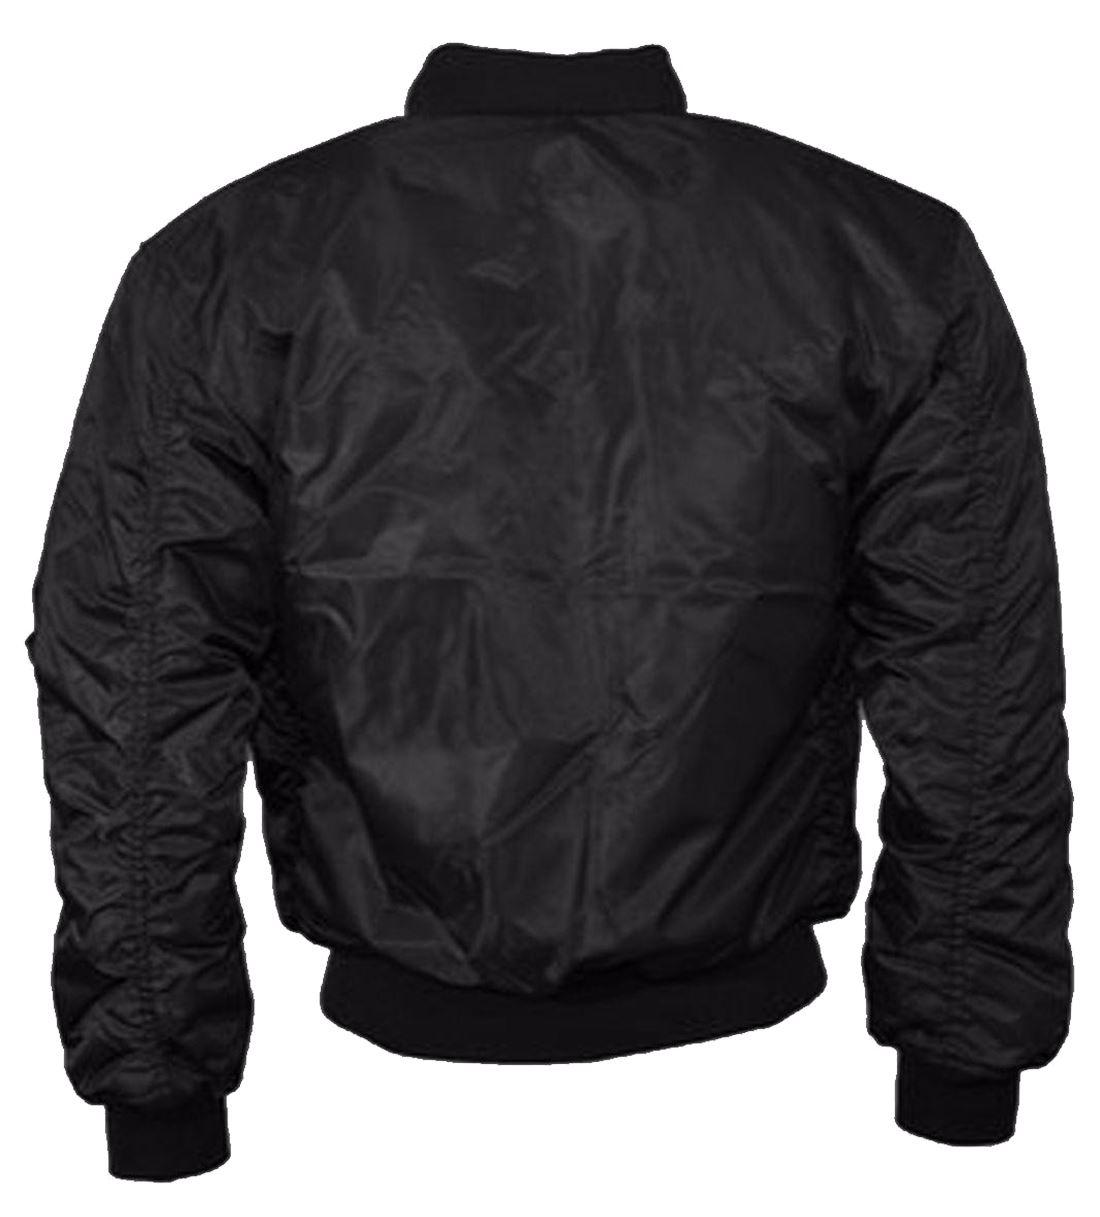 Womens Inspired Plain MA1 Bomber Jacket Ladies Long Sleeve ZipUp Party Wear Coat